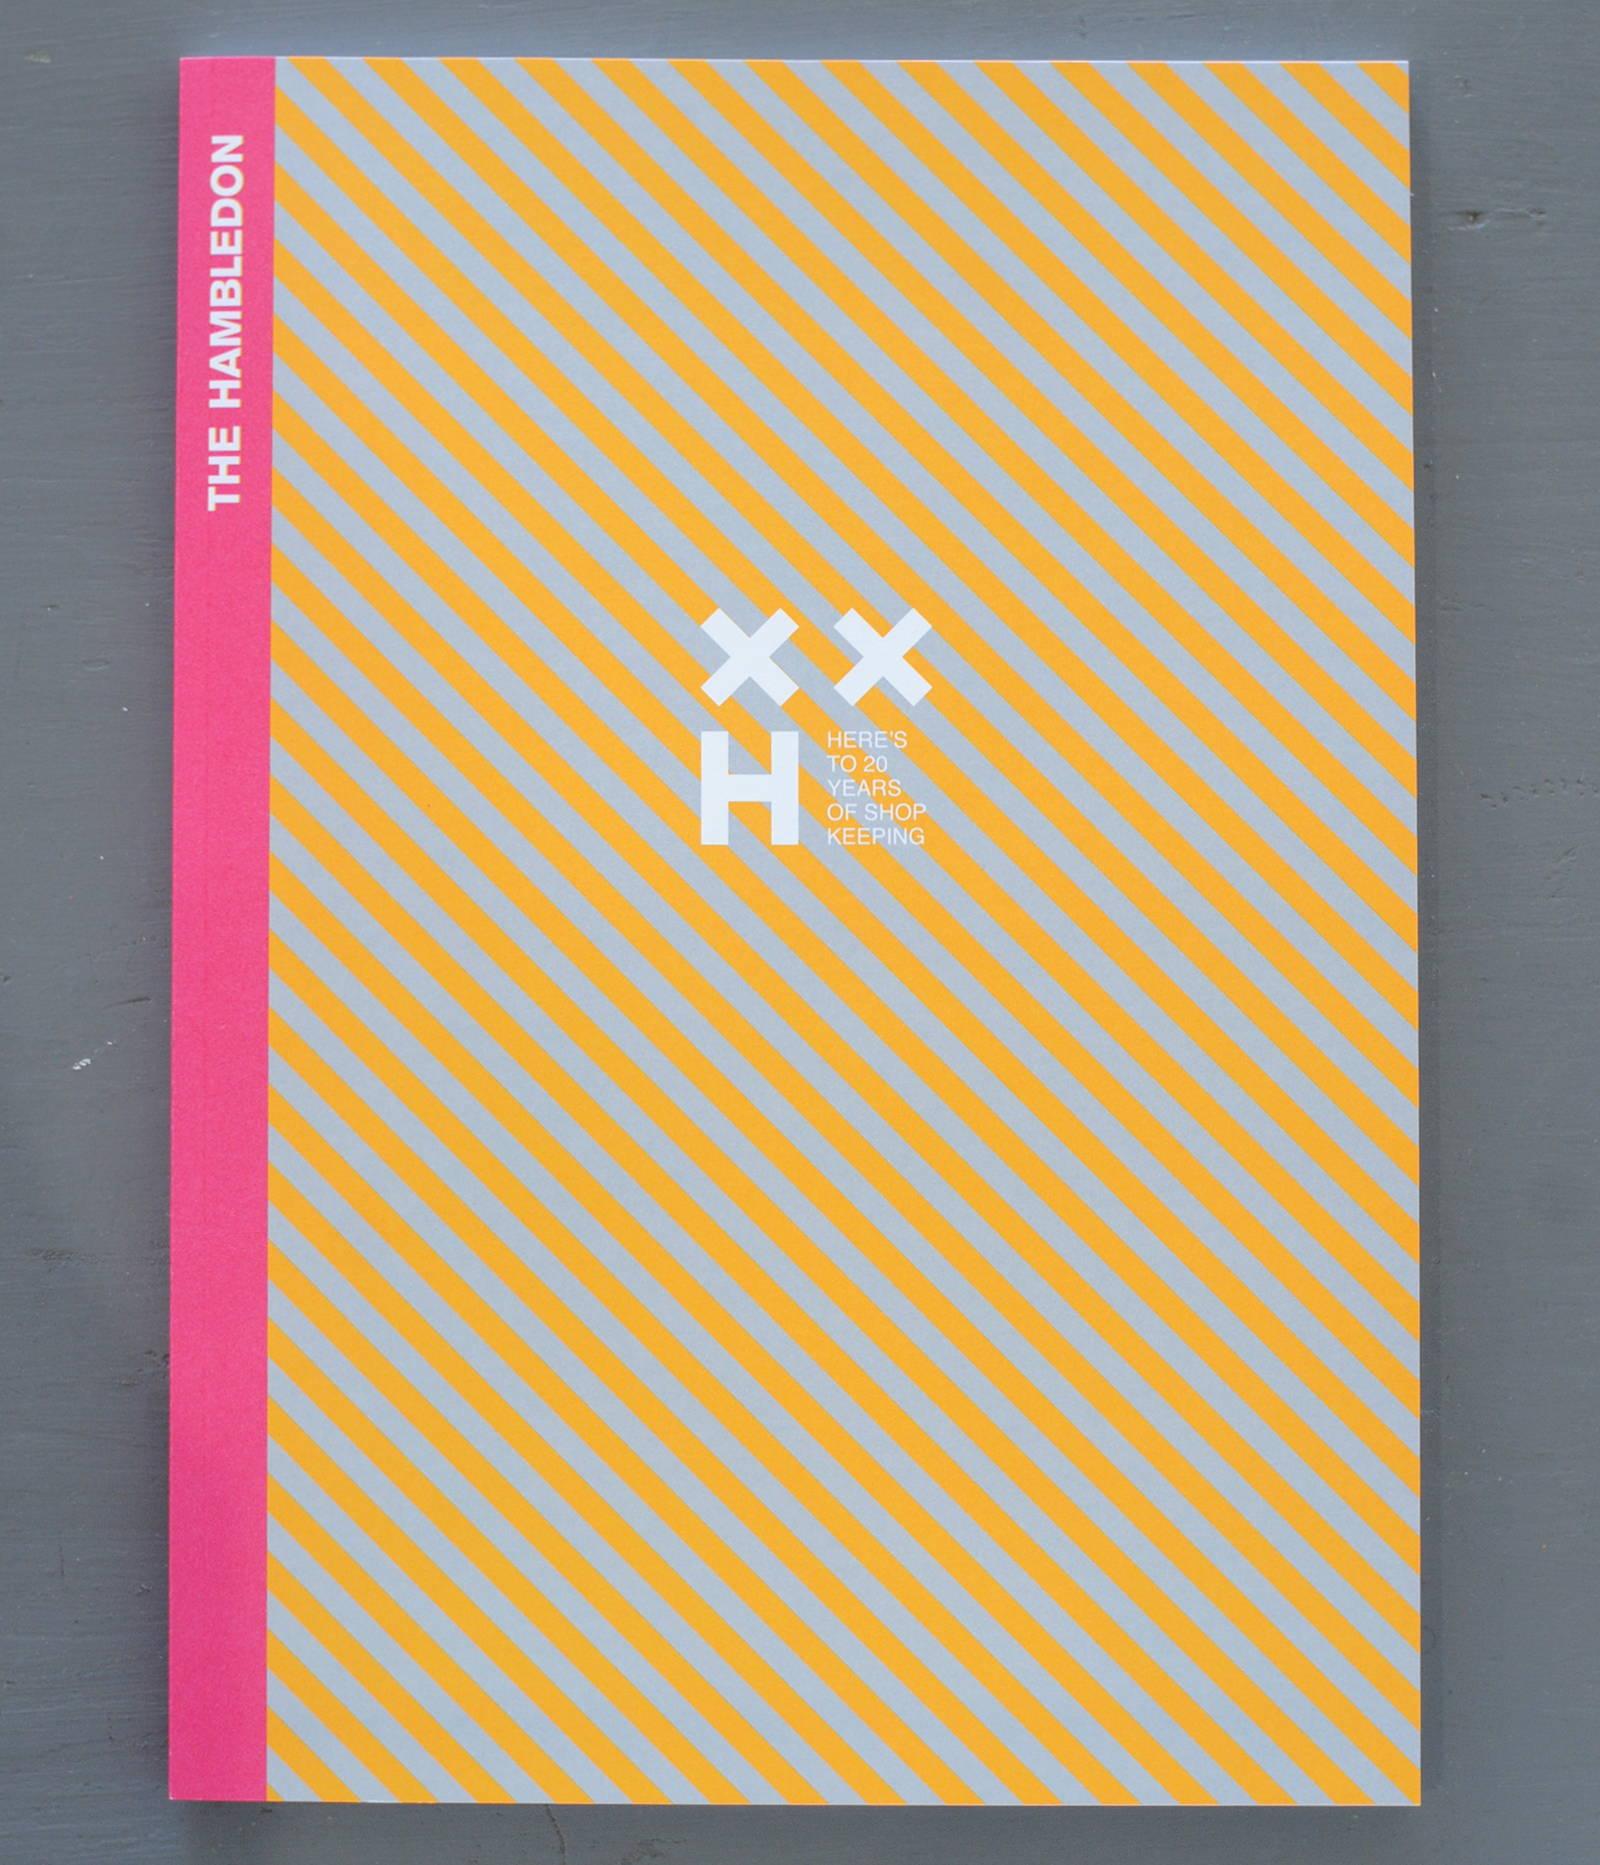 The Hambledon's 20th Birthday Publication